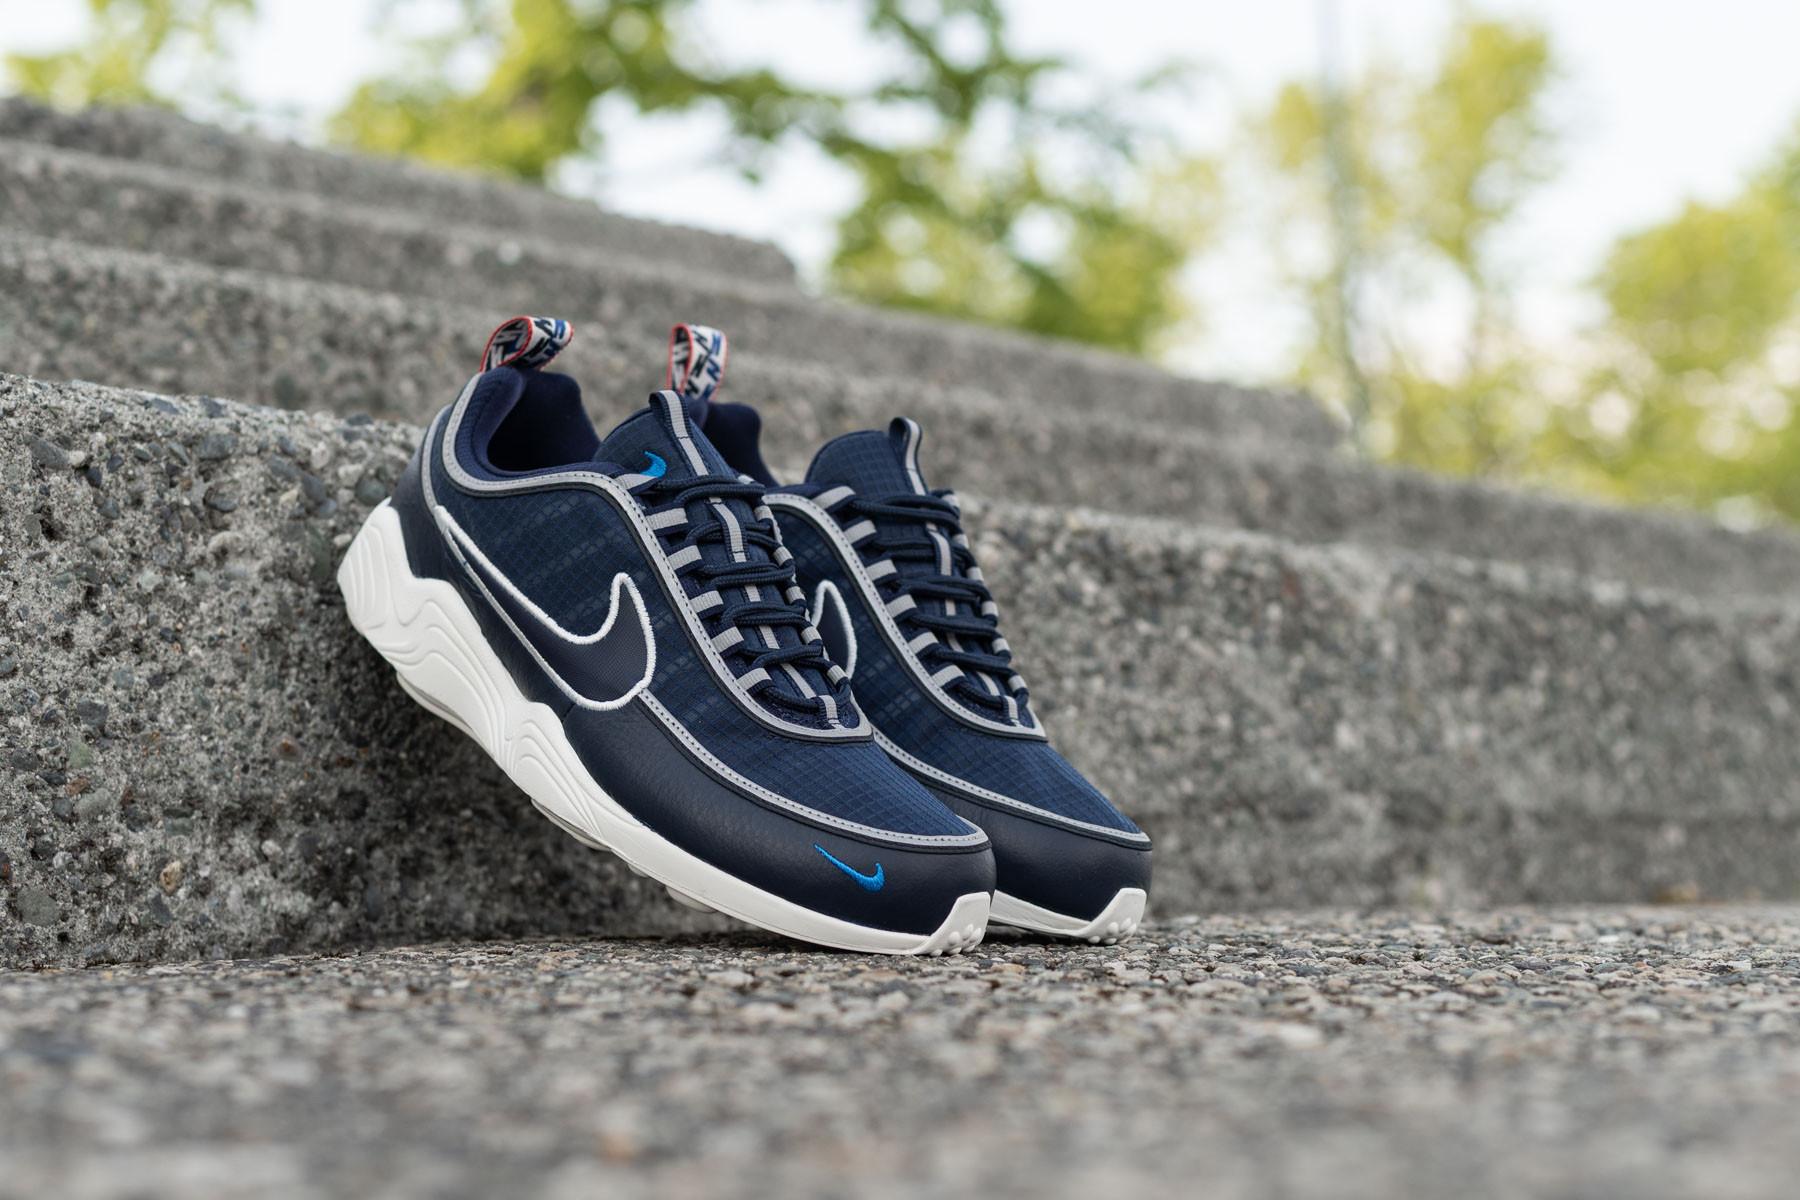 online store 492b4 24bbf Nike Air Zoom Spiridon SE - Herre - Sneakers - Sneaker.no